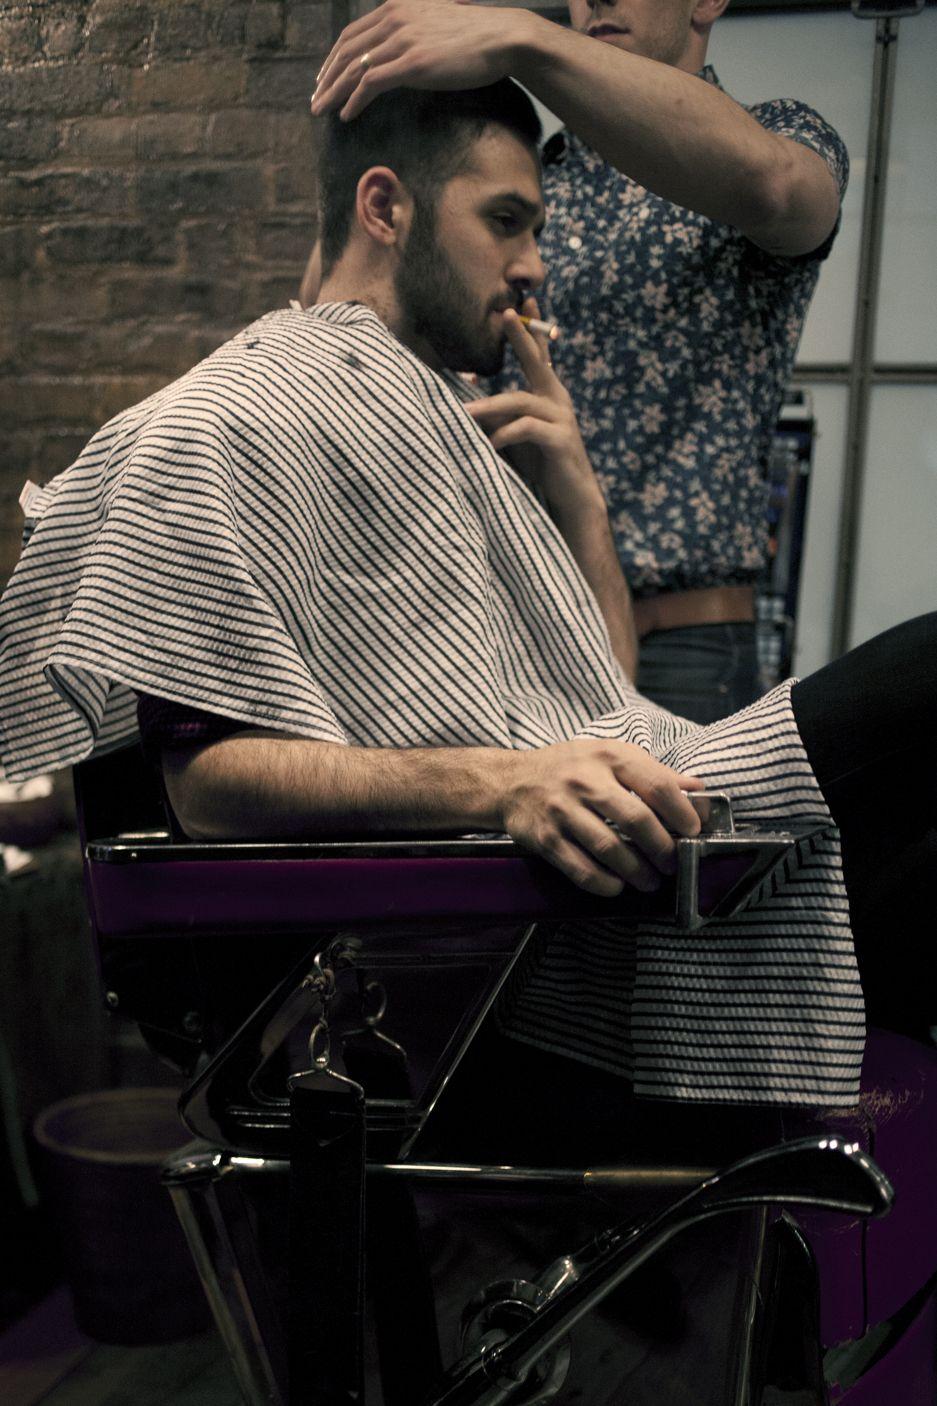 Mens haircuts denver barber shop  menswear  pinterest  discover more ideas about